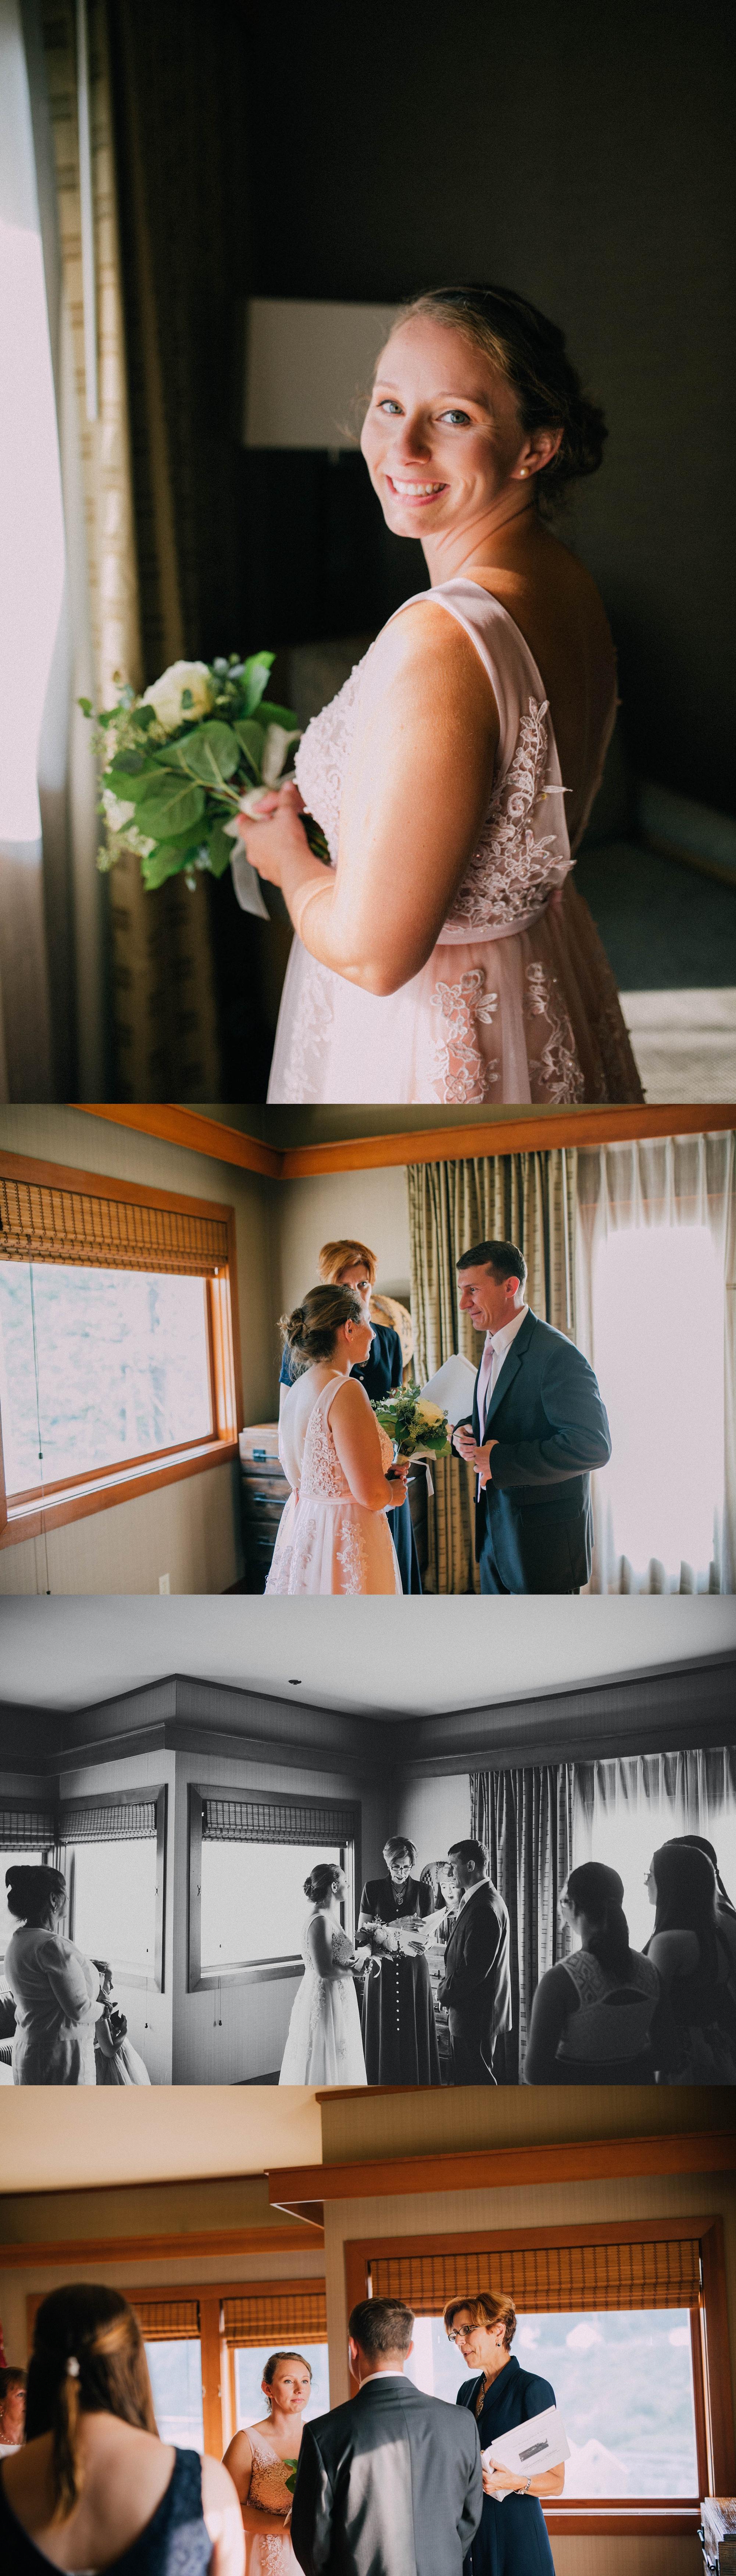 ashley_vos_seattle_ wedding_photographer_0481.jpg